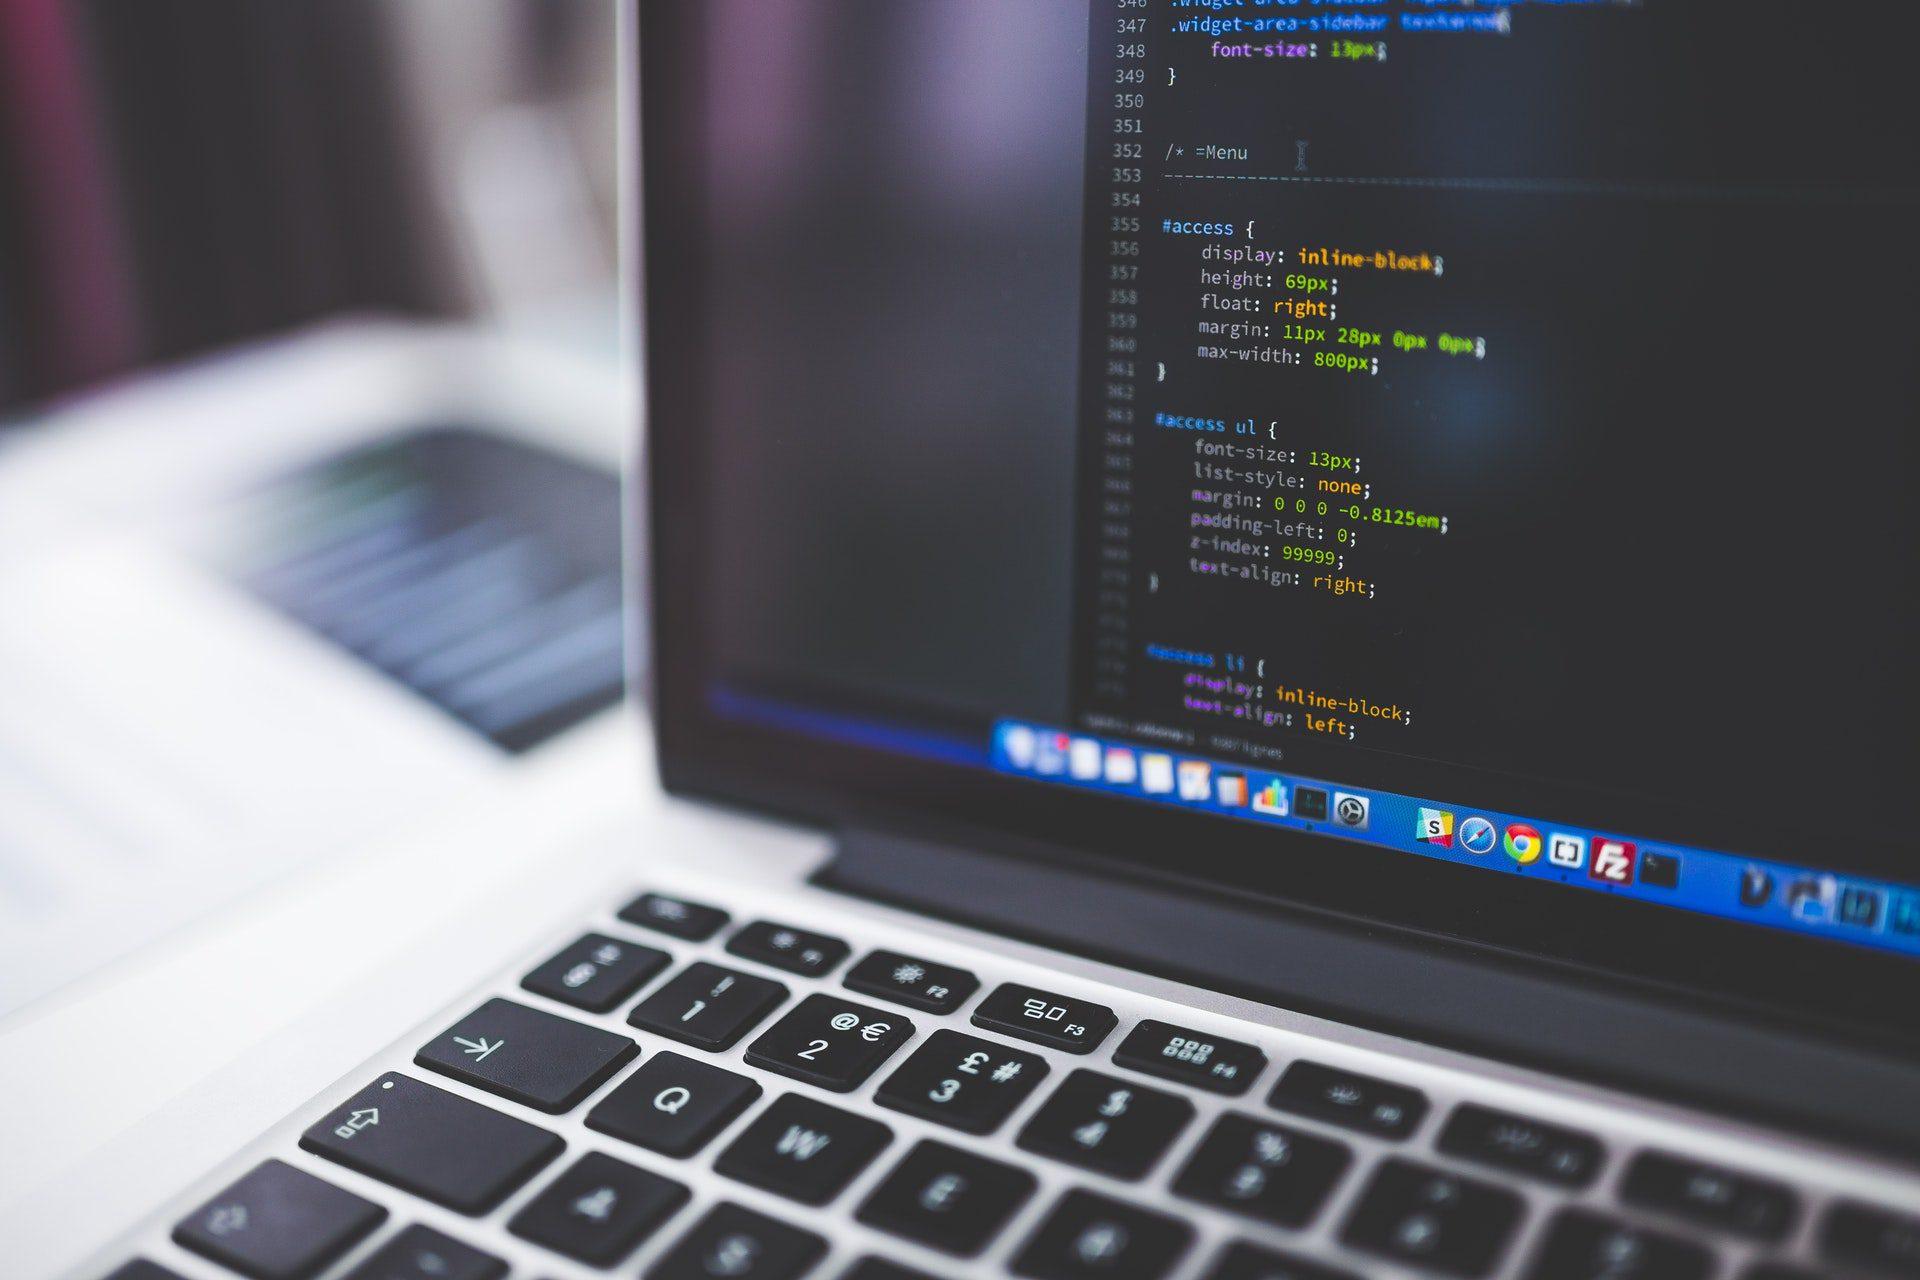 Hotfoot is hiring a Web Developer